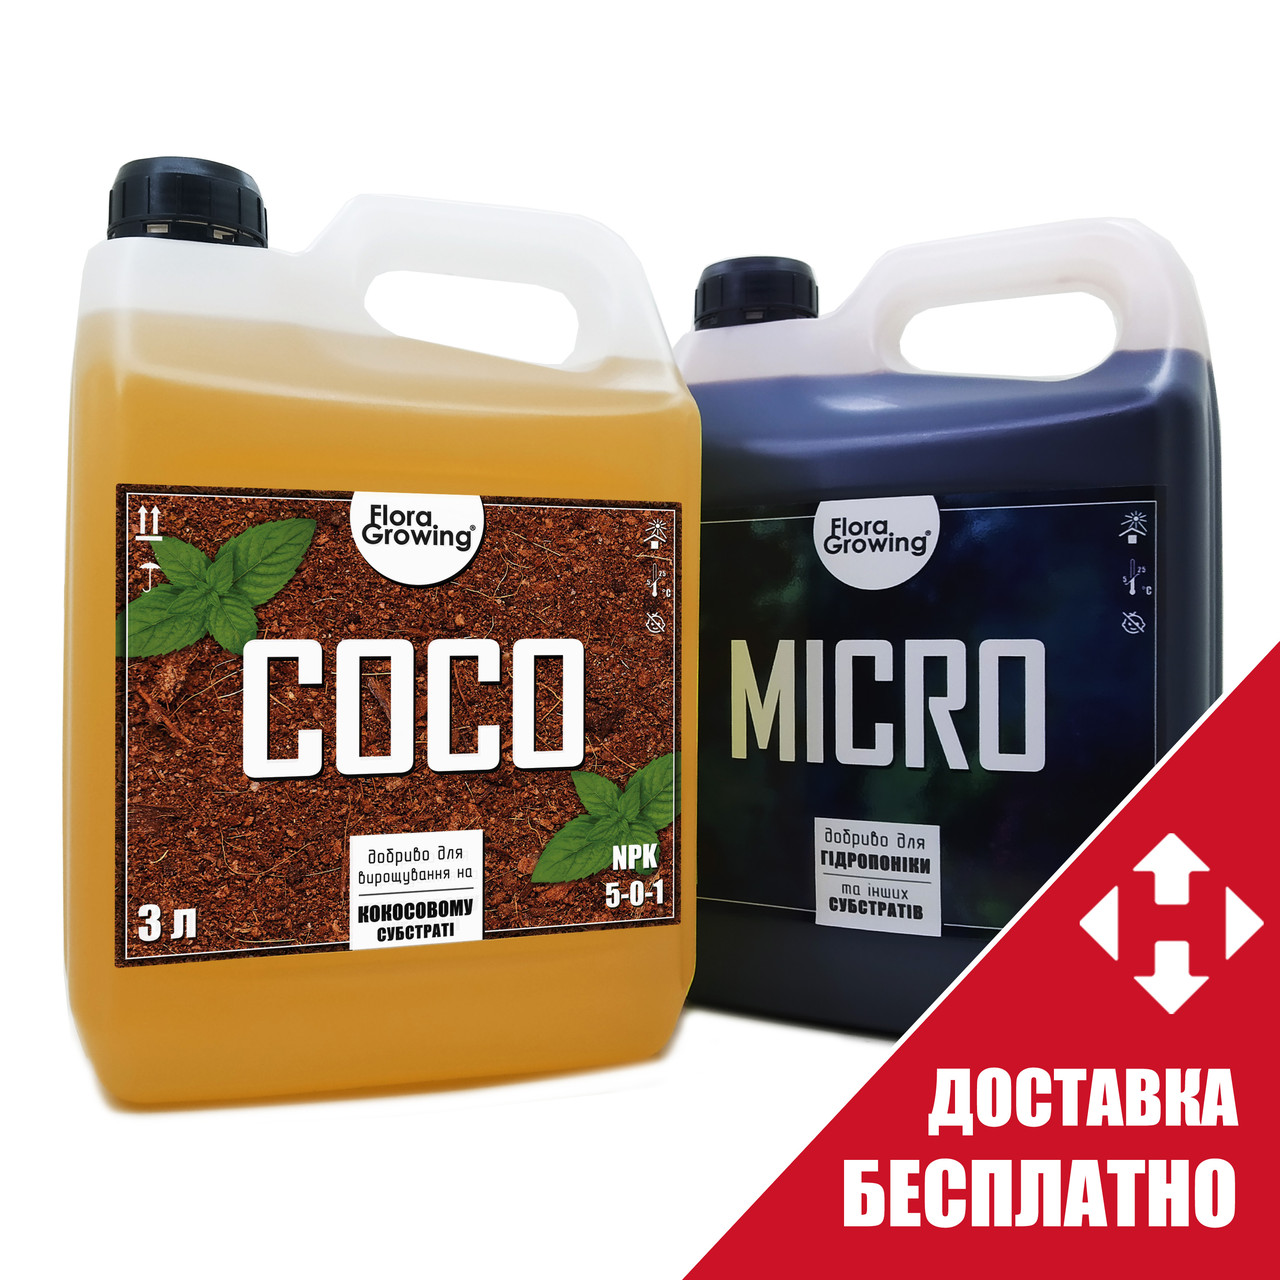 2 х 3 л Coco Kit - Комплект удобрений для выращивания в кокосовом субстрате